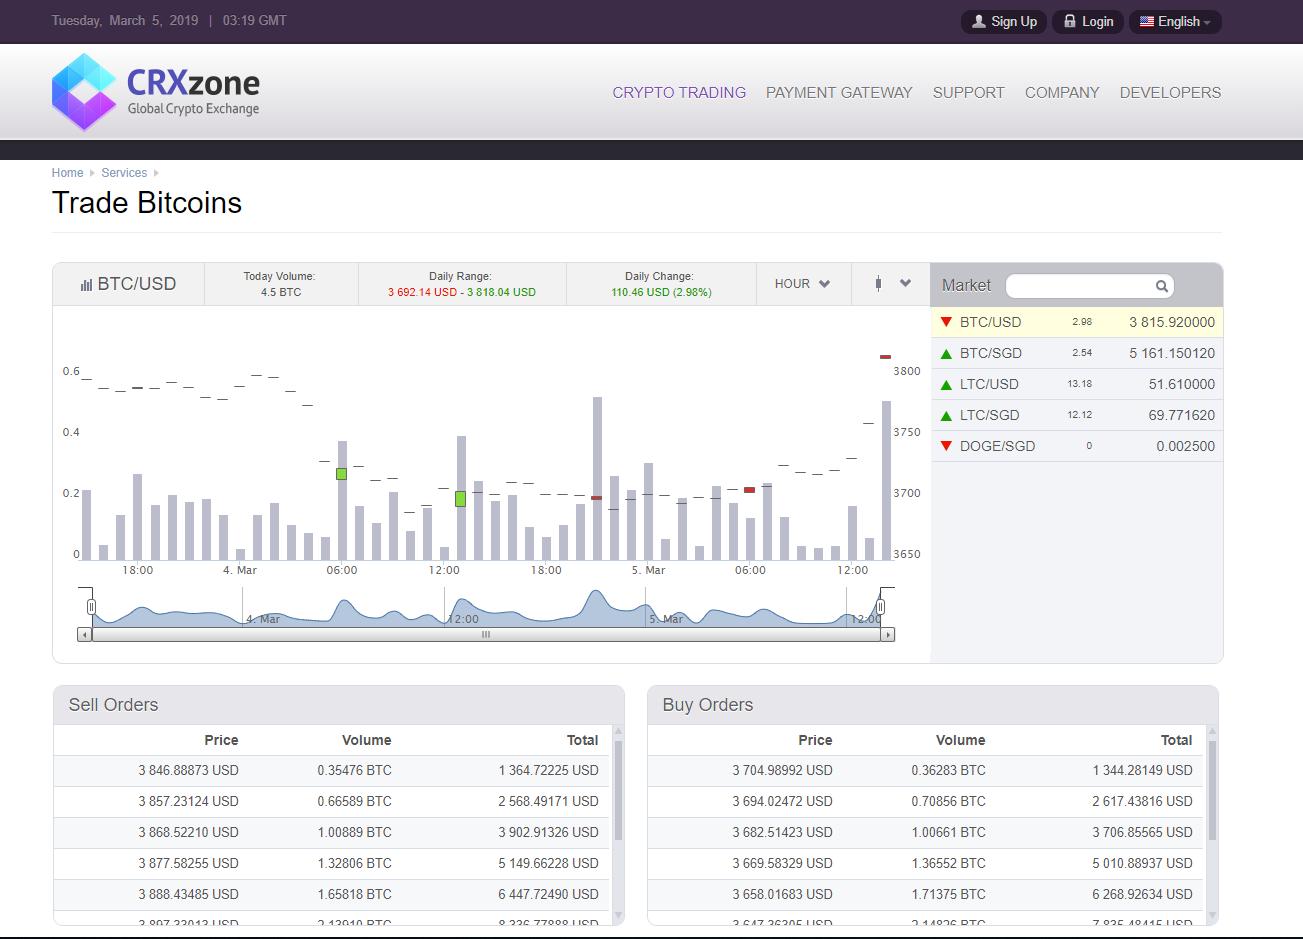 CRXzone Trading View